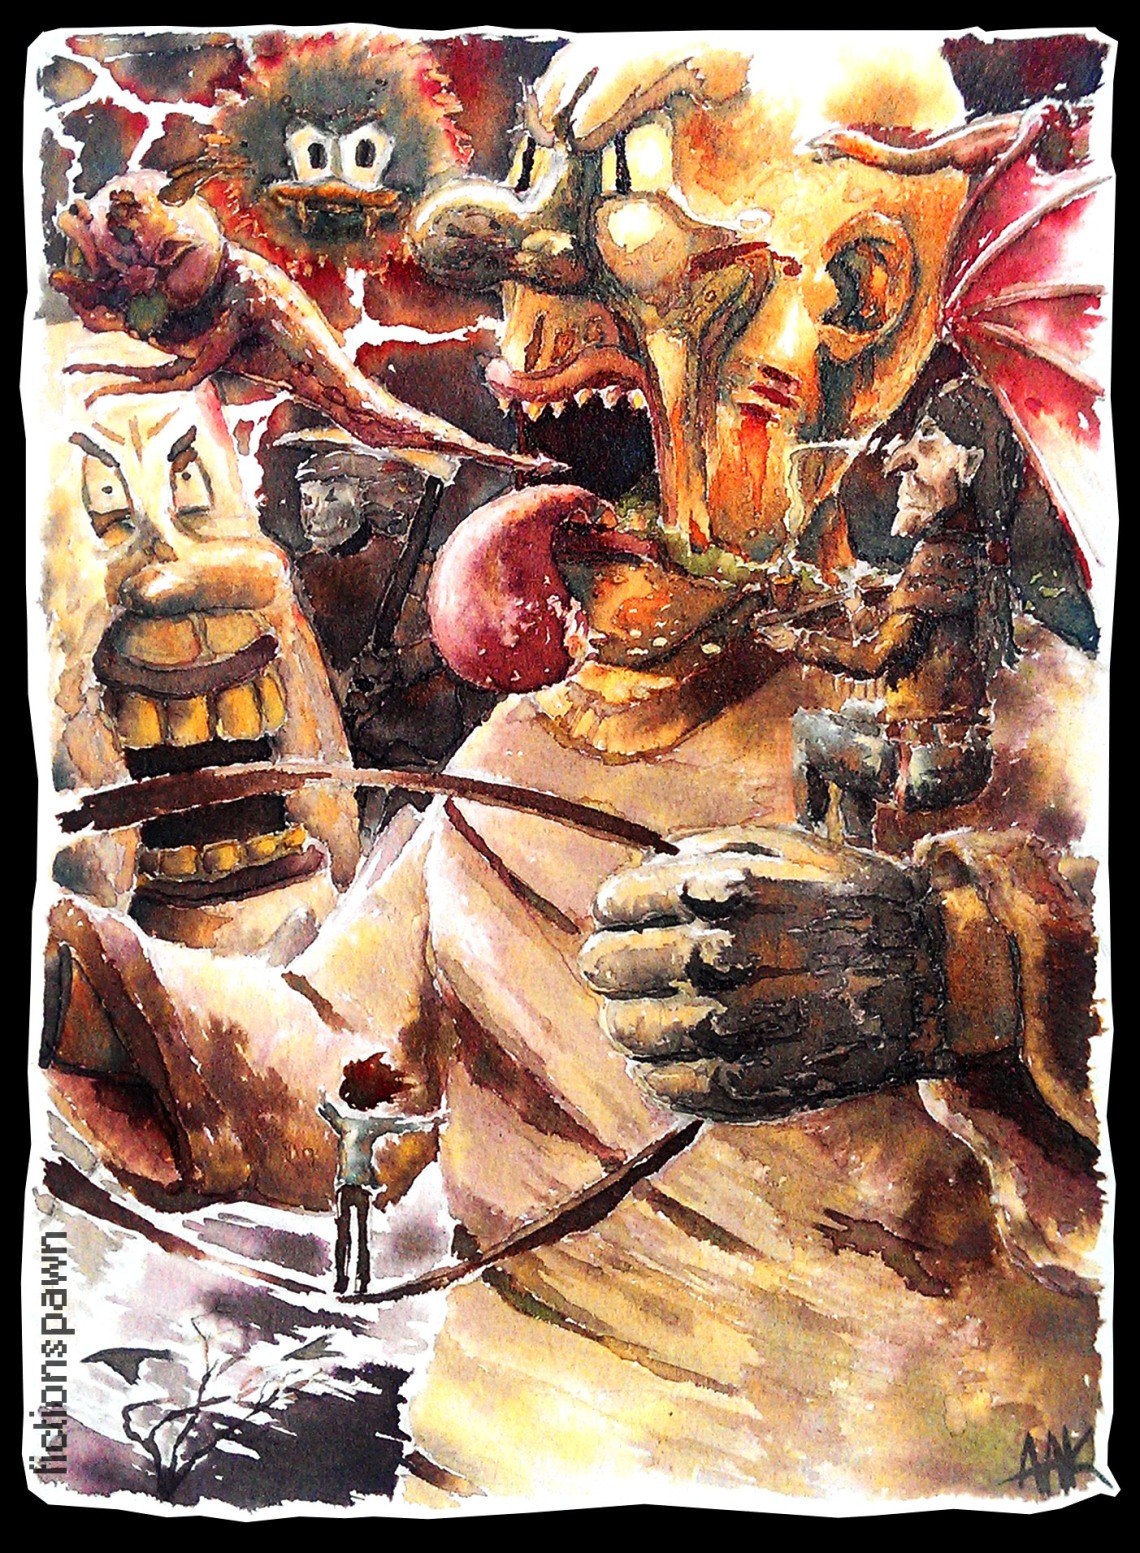 A man riding through a nightmare Aak fictionspawn